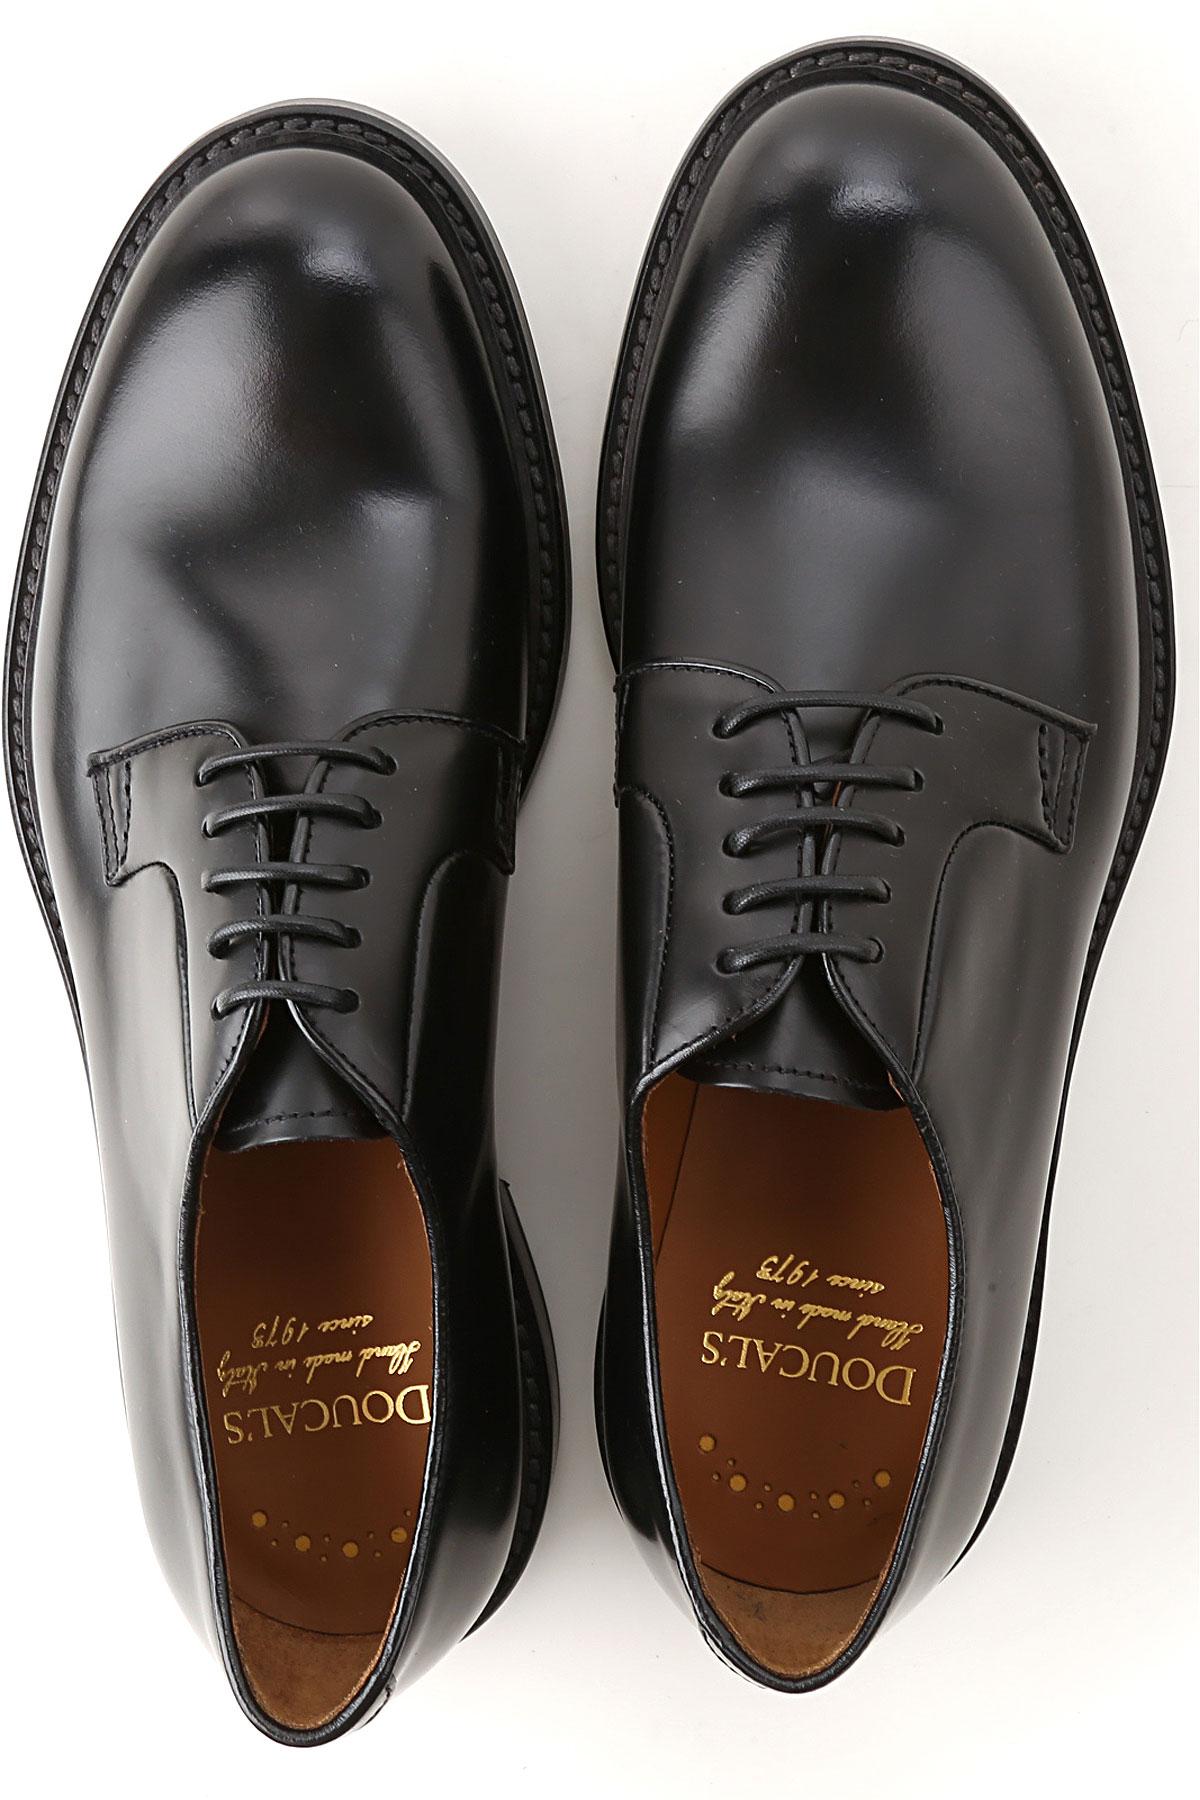 19 Otoño Negro invierno Doucals 2018 Zapatos Para Hombres nbsp; YCxt6qw